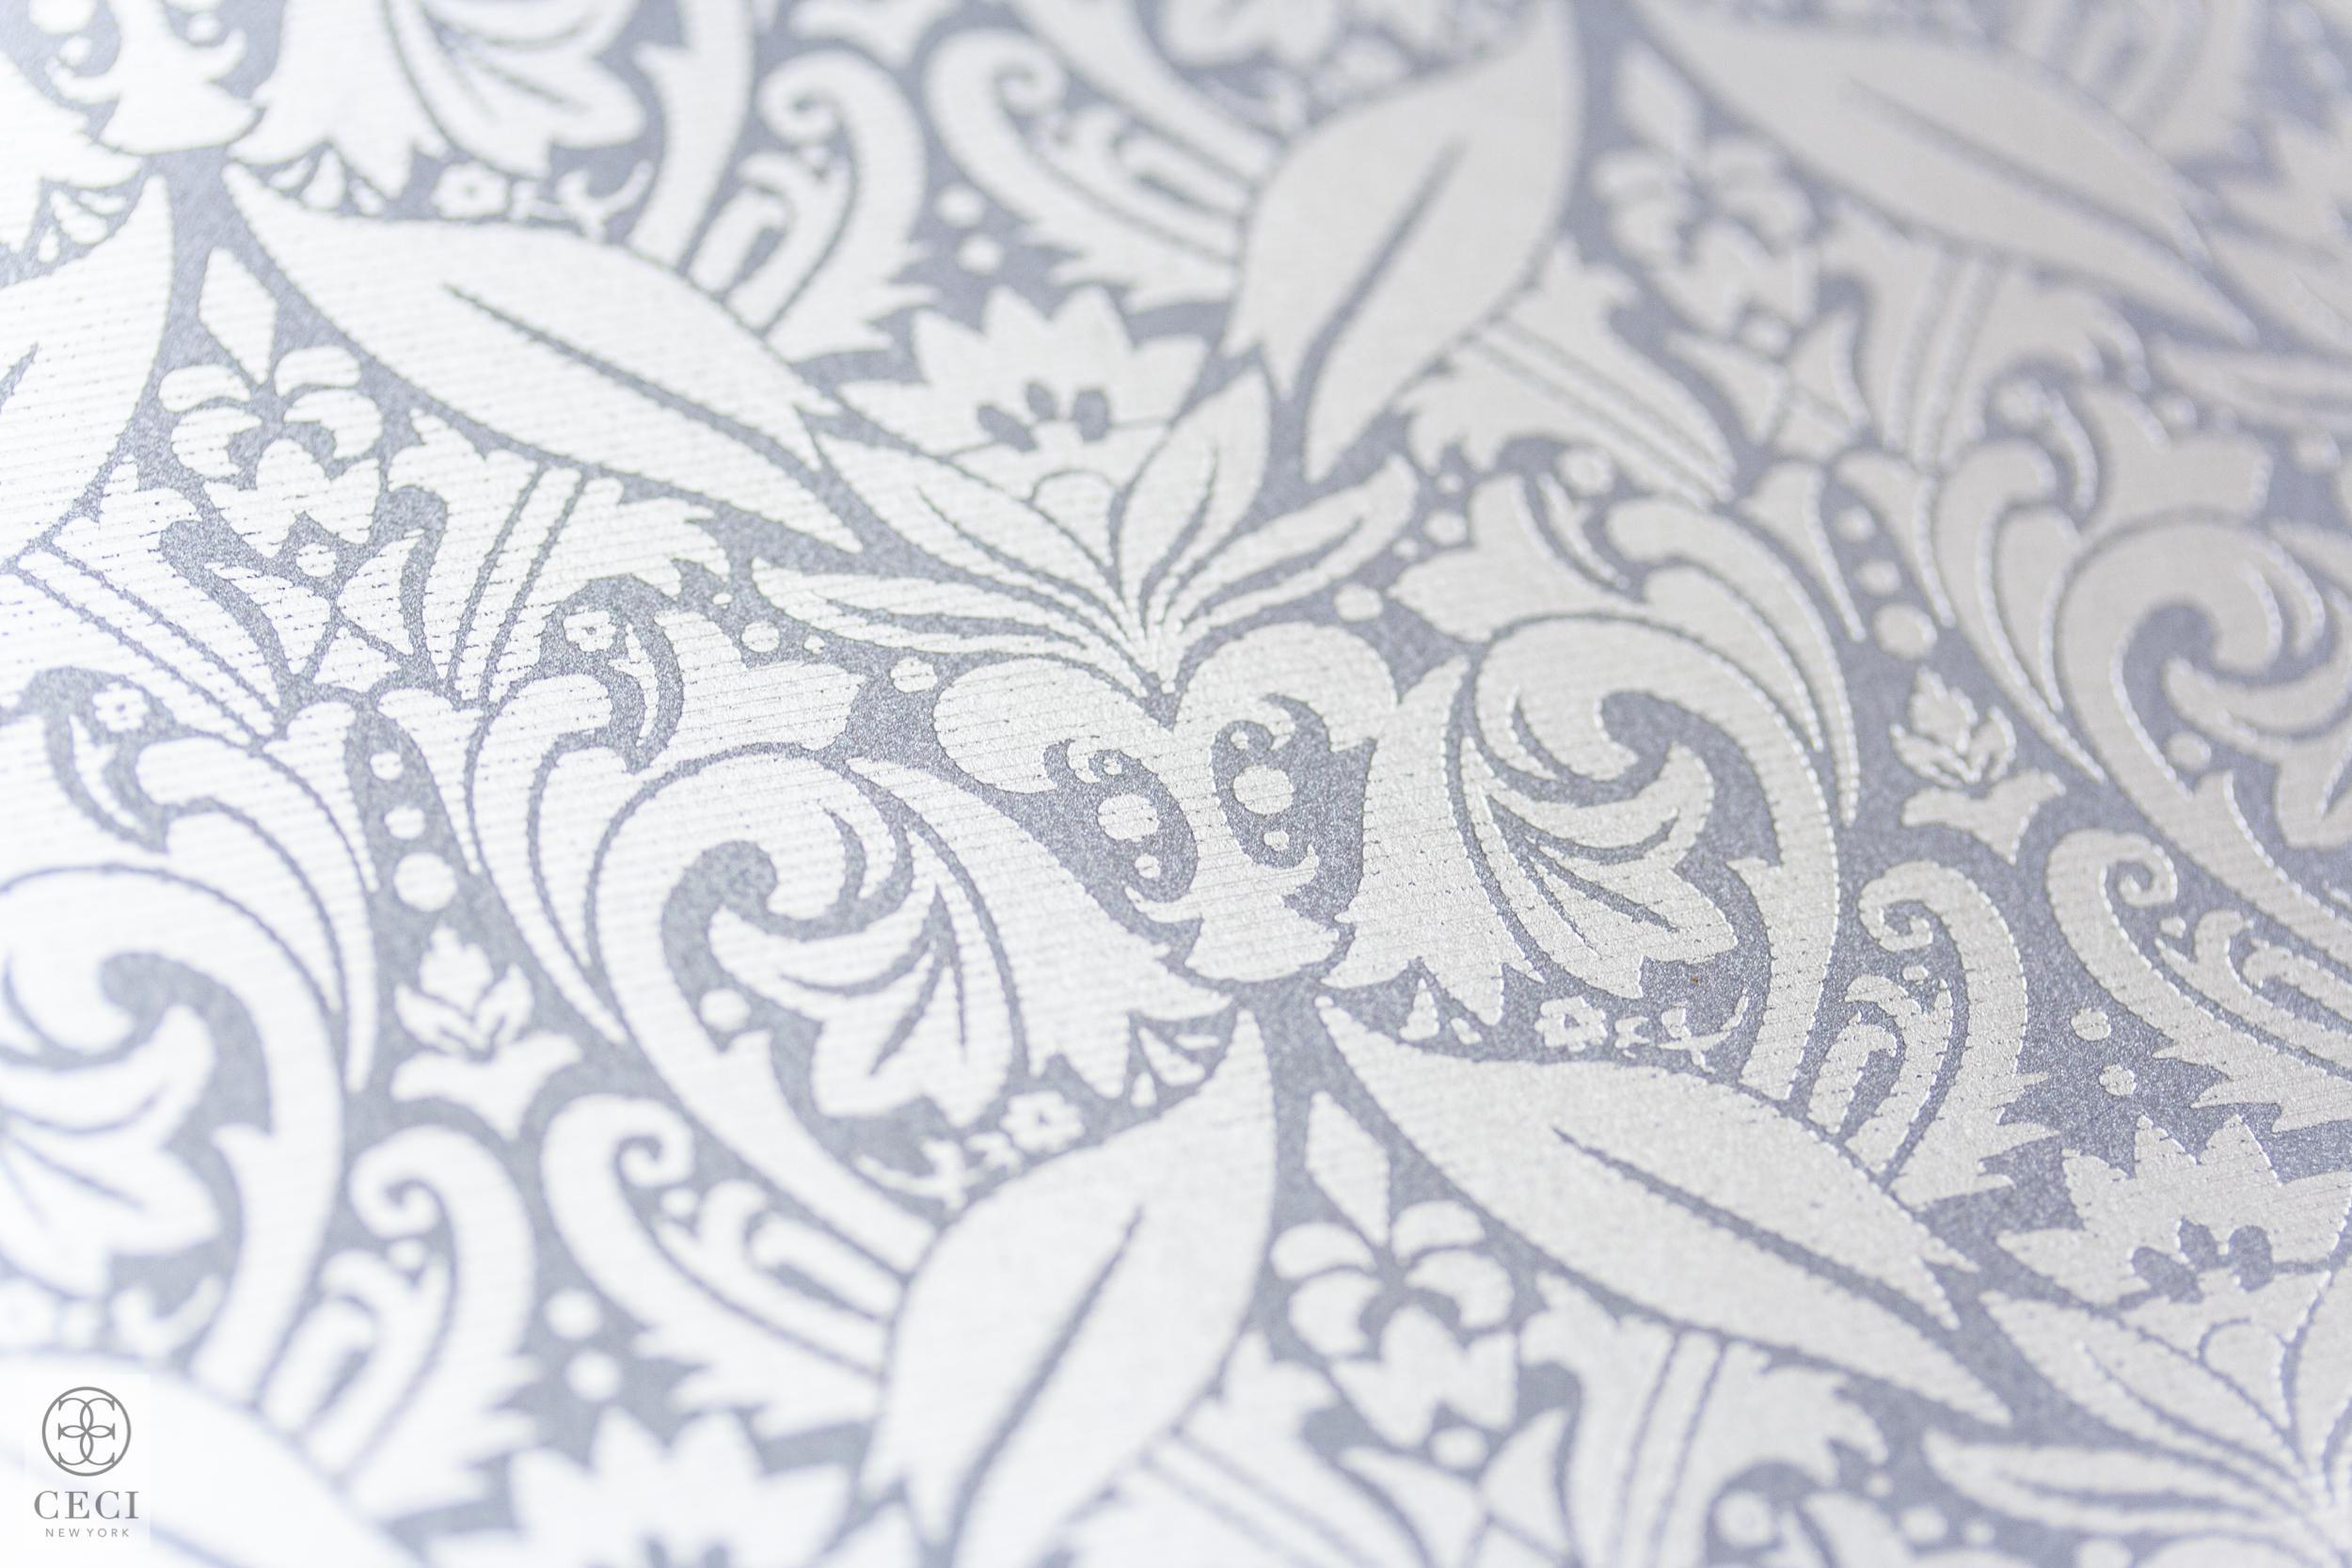 ceci_new_york_wedding_invitation_design_custom_watercolor_purple_damask_lasercut_-1.jpg